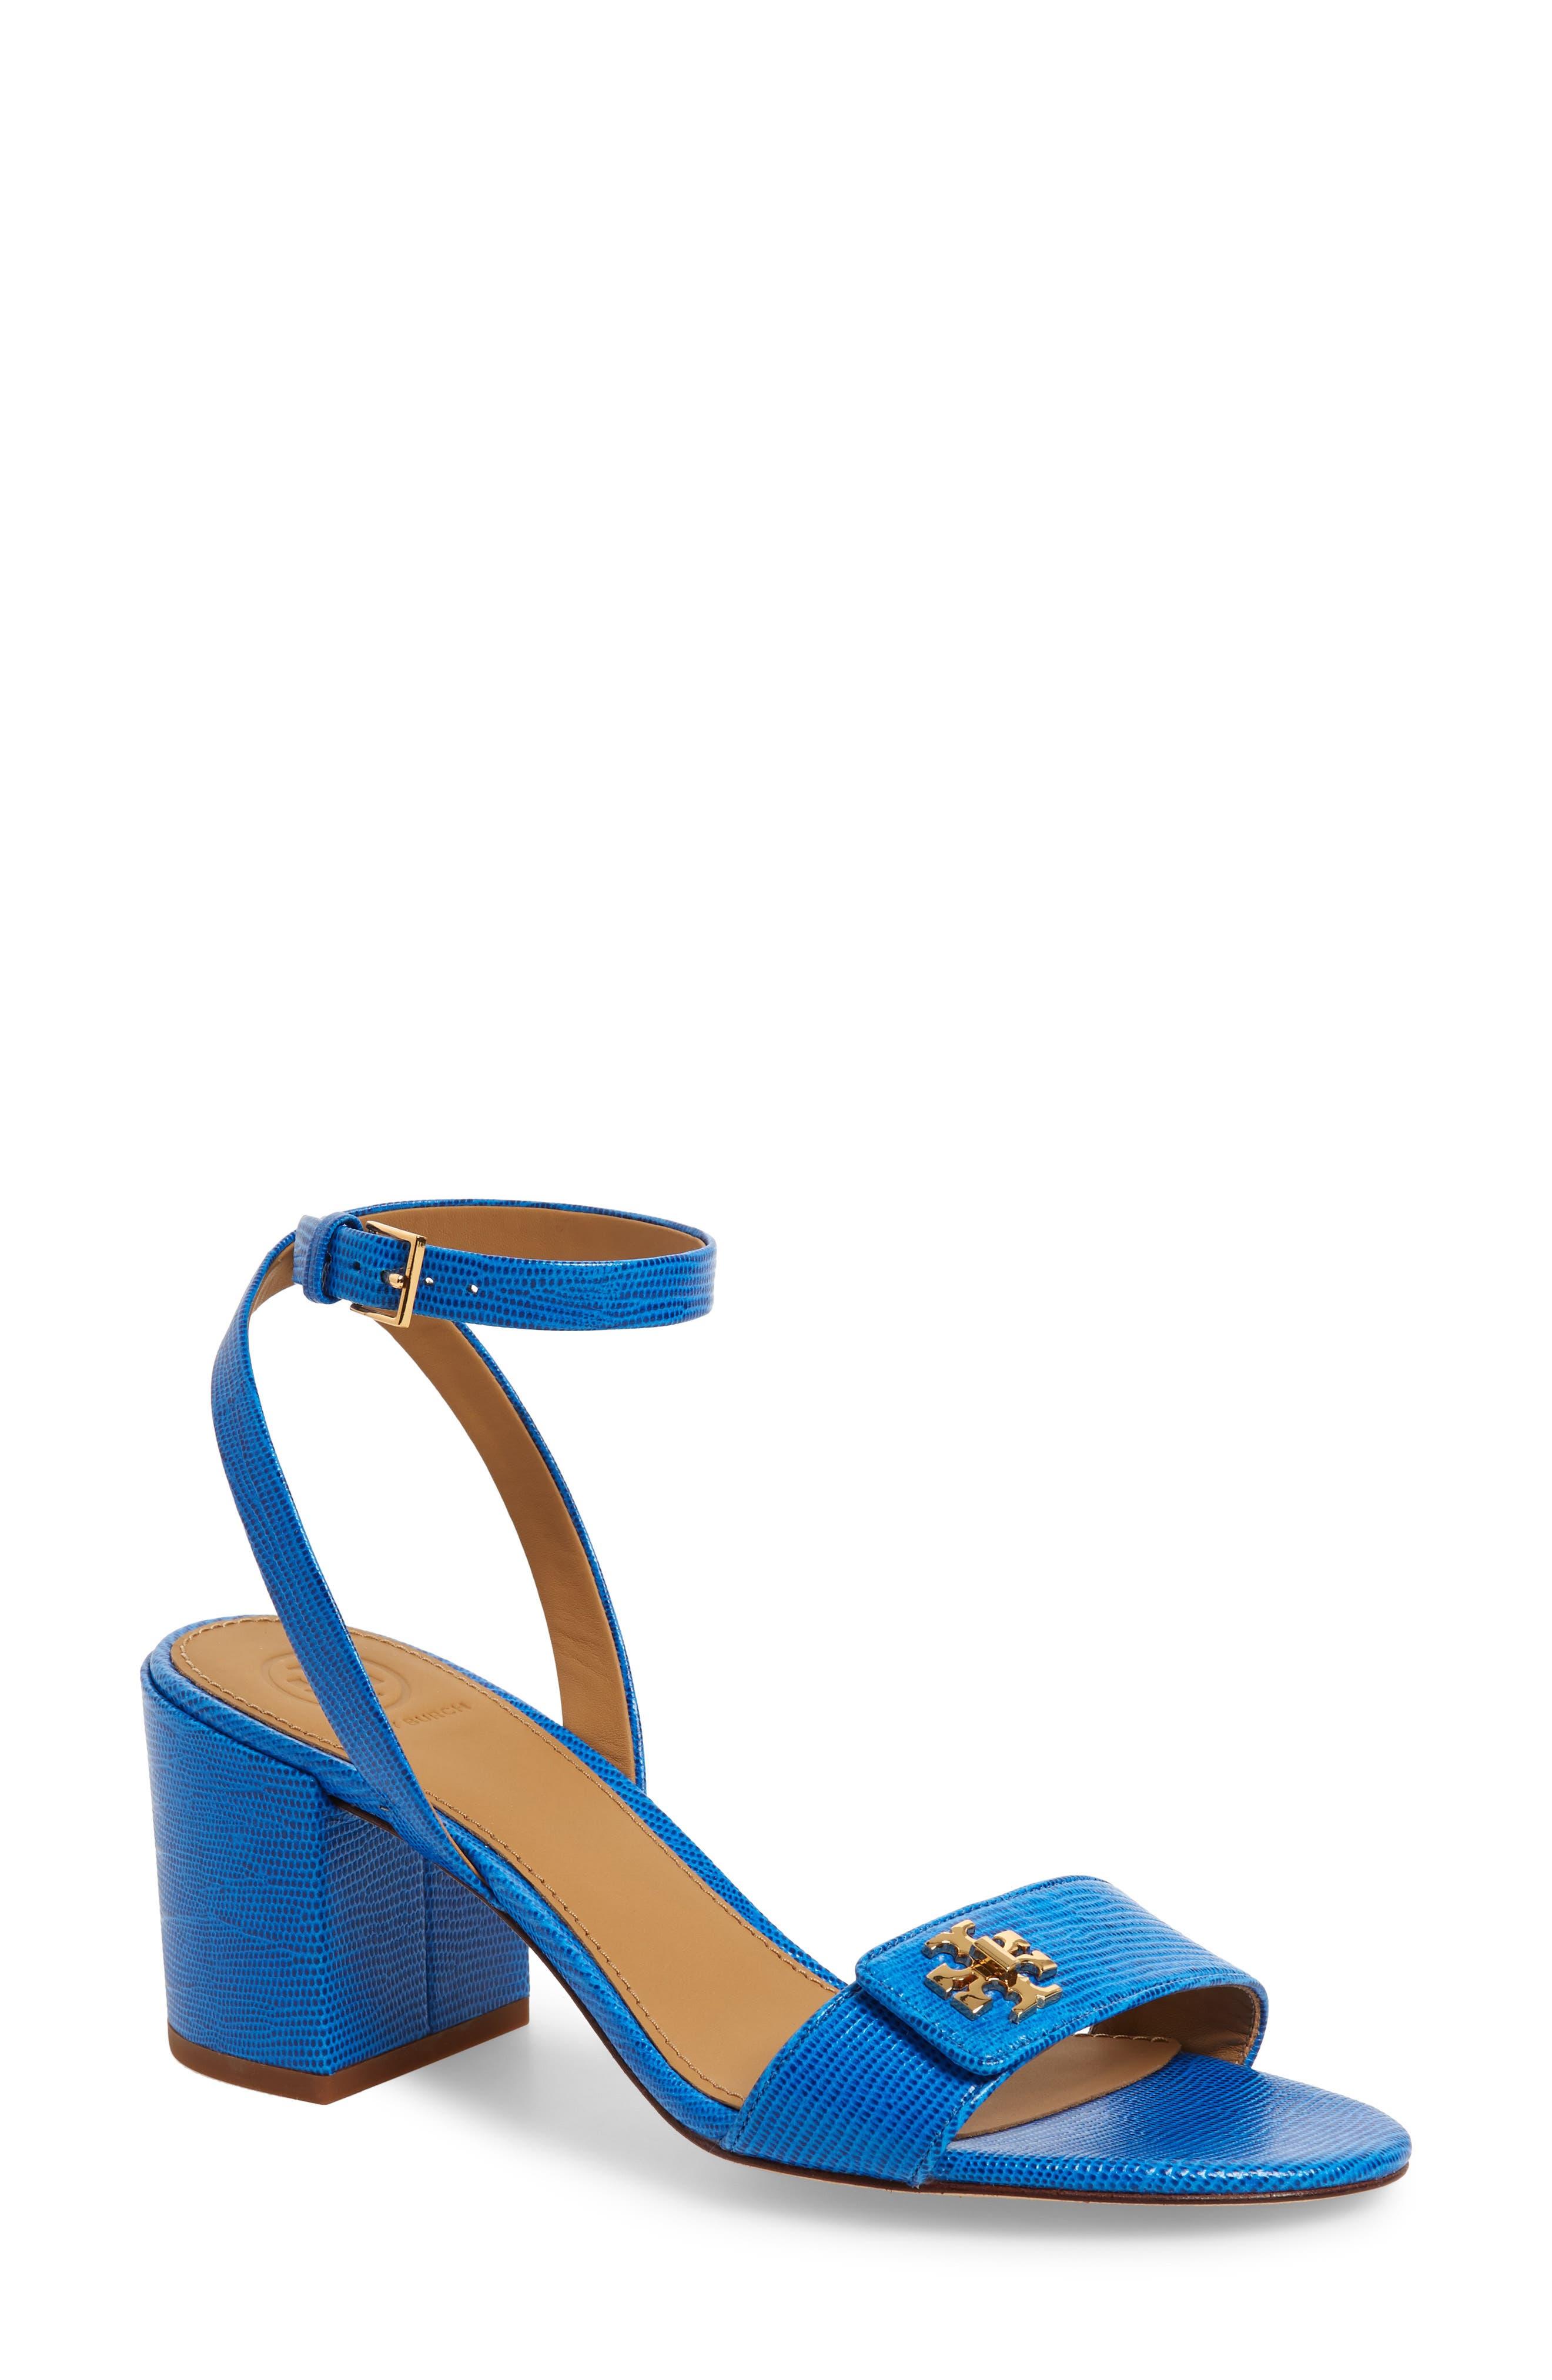 TORY BURCH Kira Block Heel Sandal, Main, color, BRIGHT TROPICAL BLUE